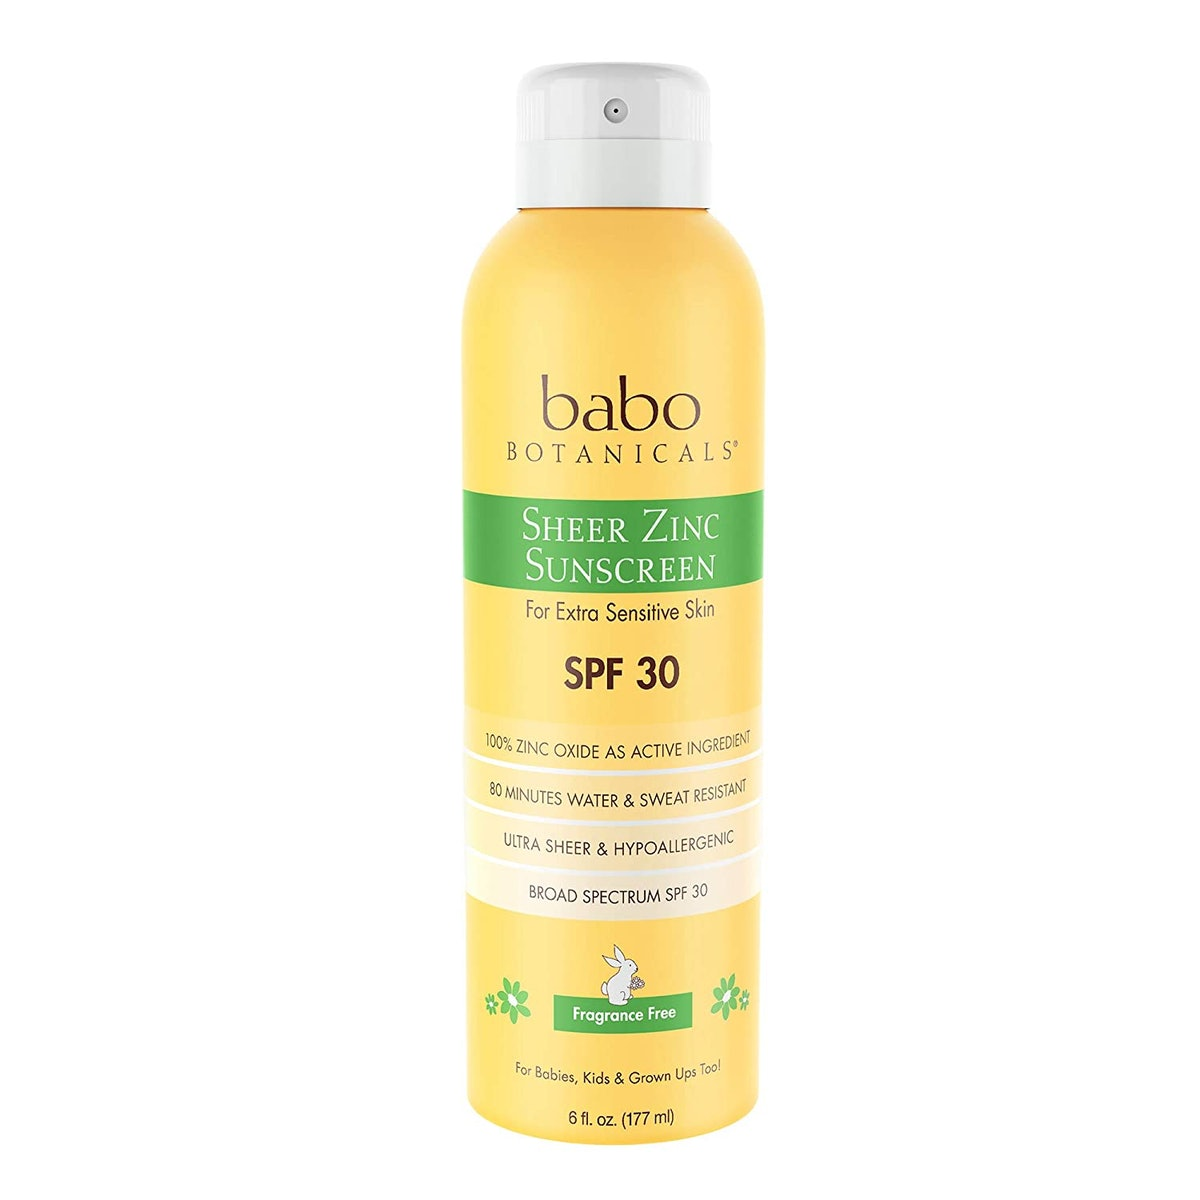 Babo Botanicals Sheer Zinc Continuous Spray Sunscreen